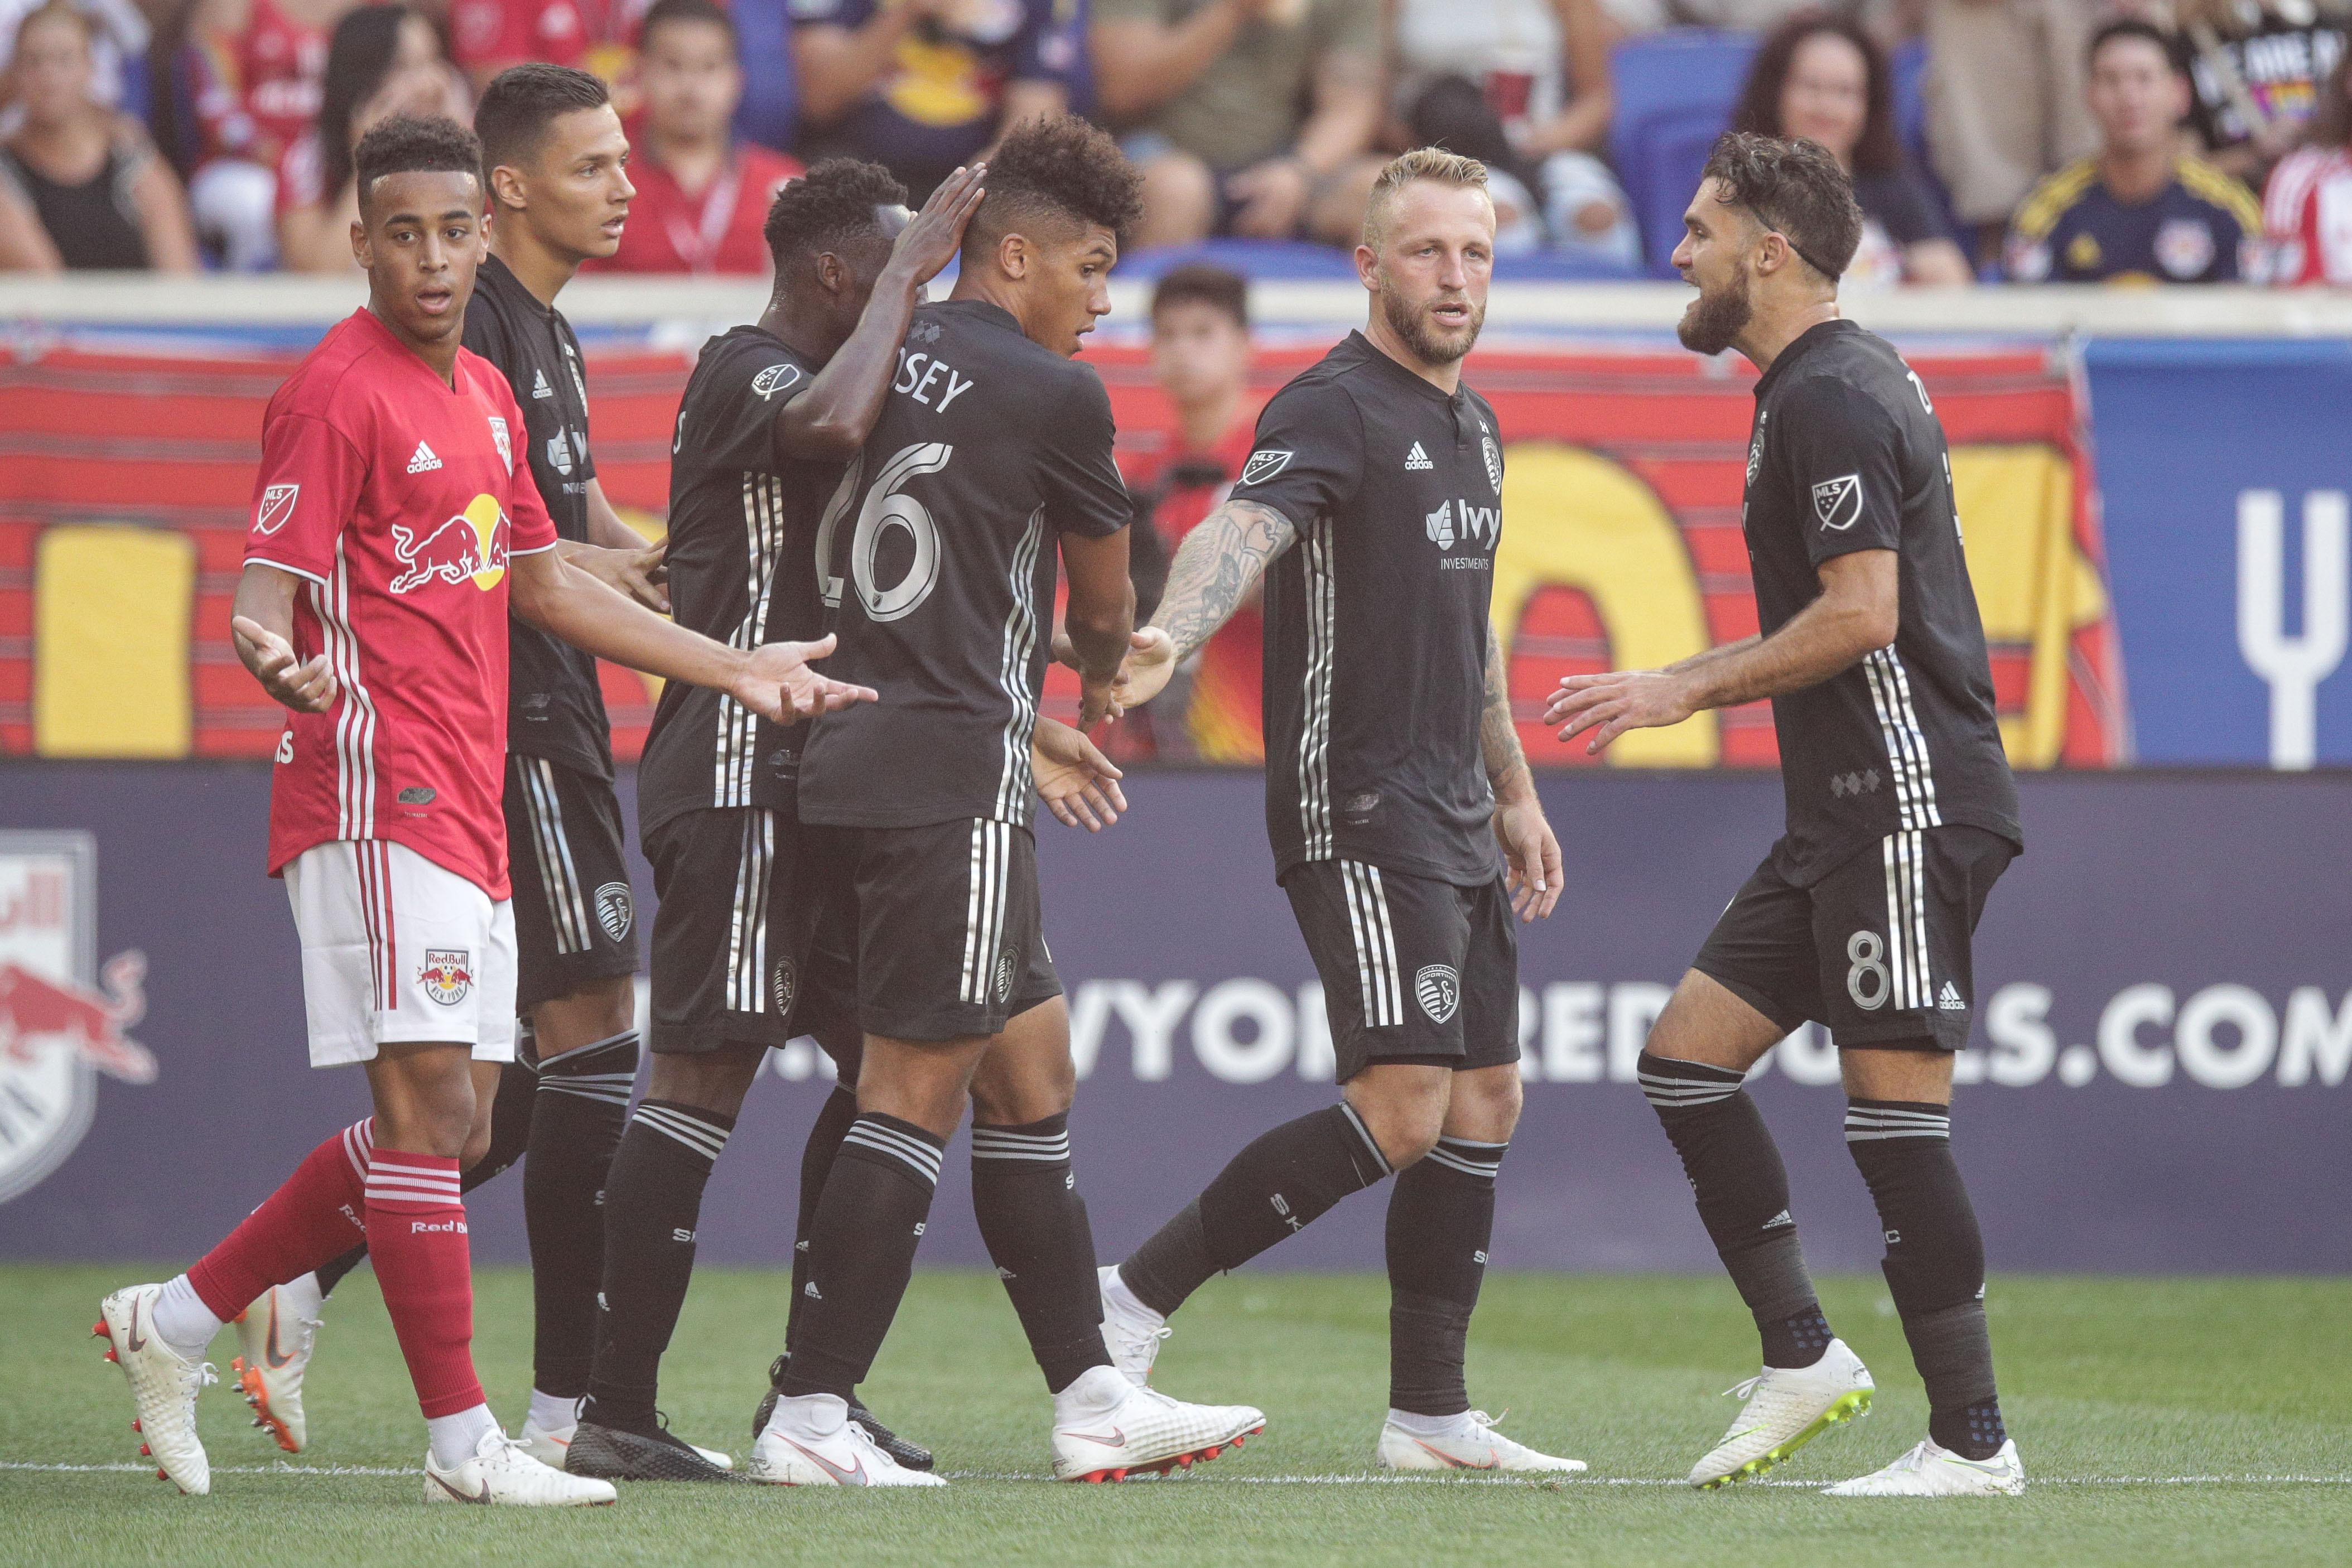 MLS: Sporting KC at New York Red Bulls